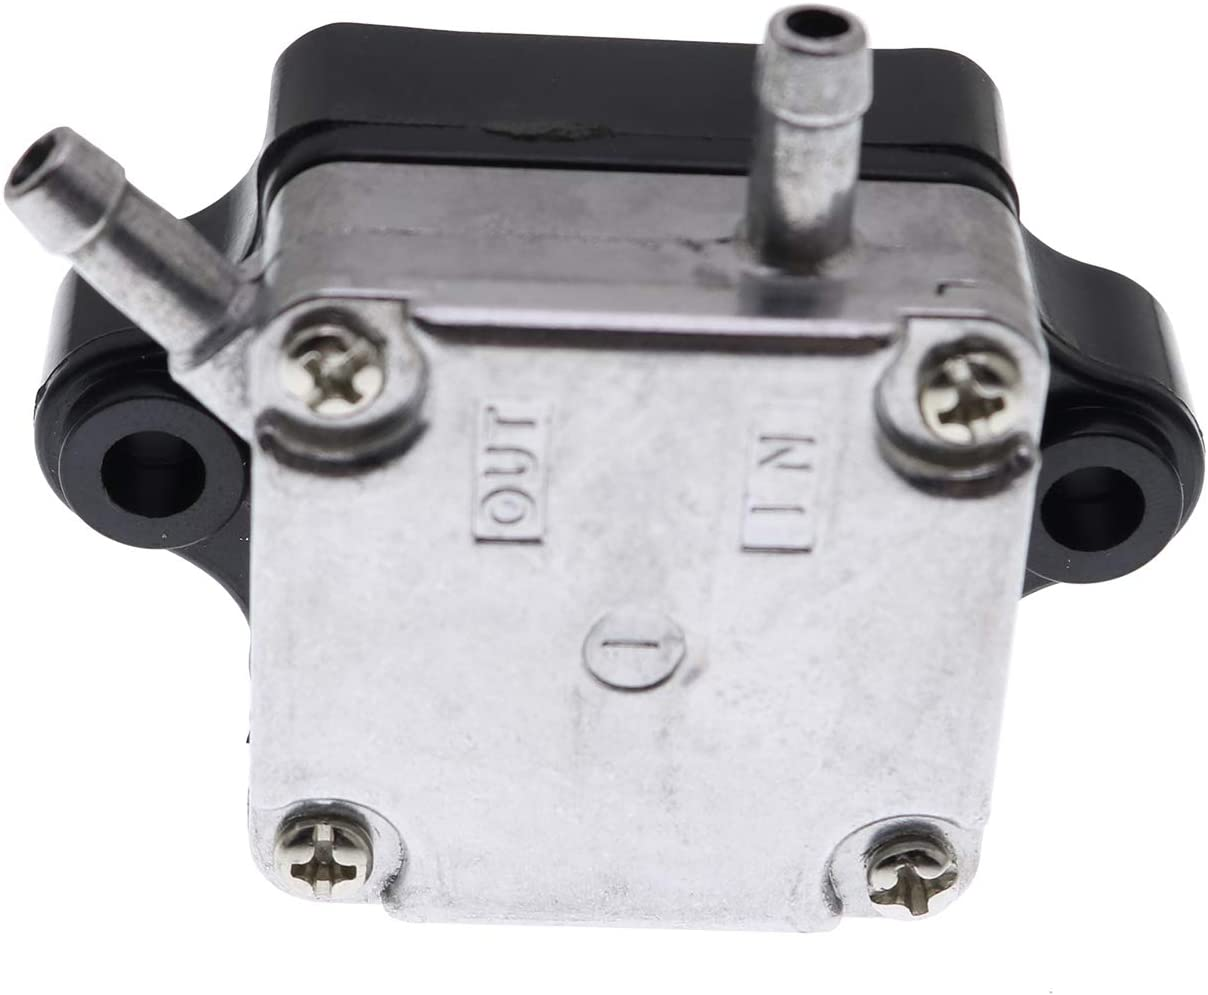 Yixin Fuel Pump 66M-24410-10-00 66M-24410-11-00 835389T1 835389A2 Fit for Yamaha Mercury 4-Stroke 9.9HP 13.5HP 15HP F9.9 F13.5 F15 Outboard Motor Sierra 18-35302